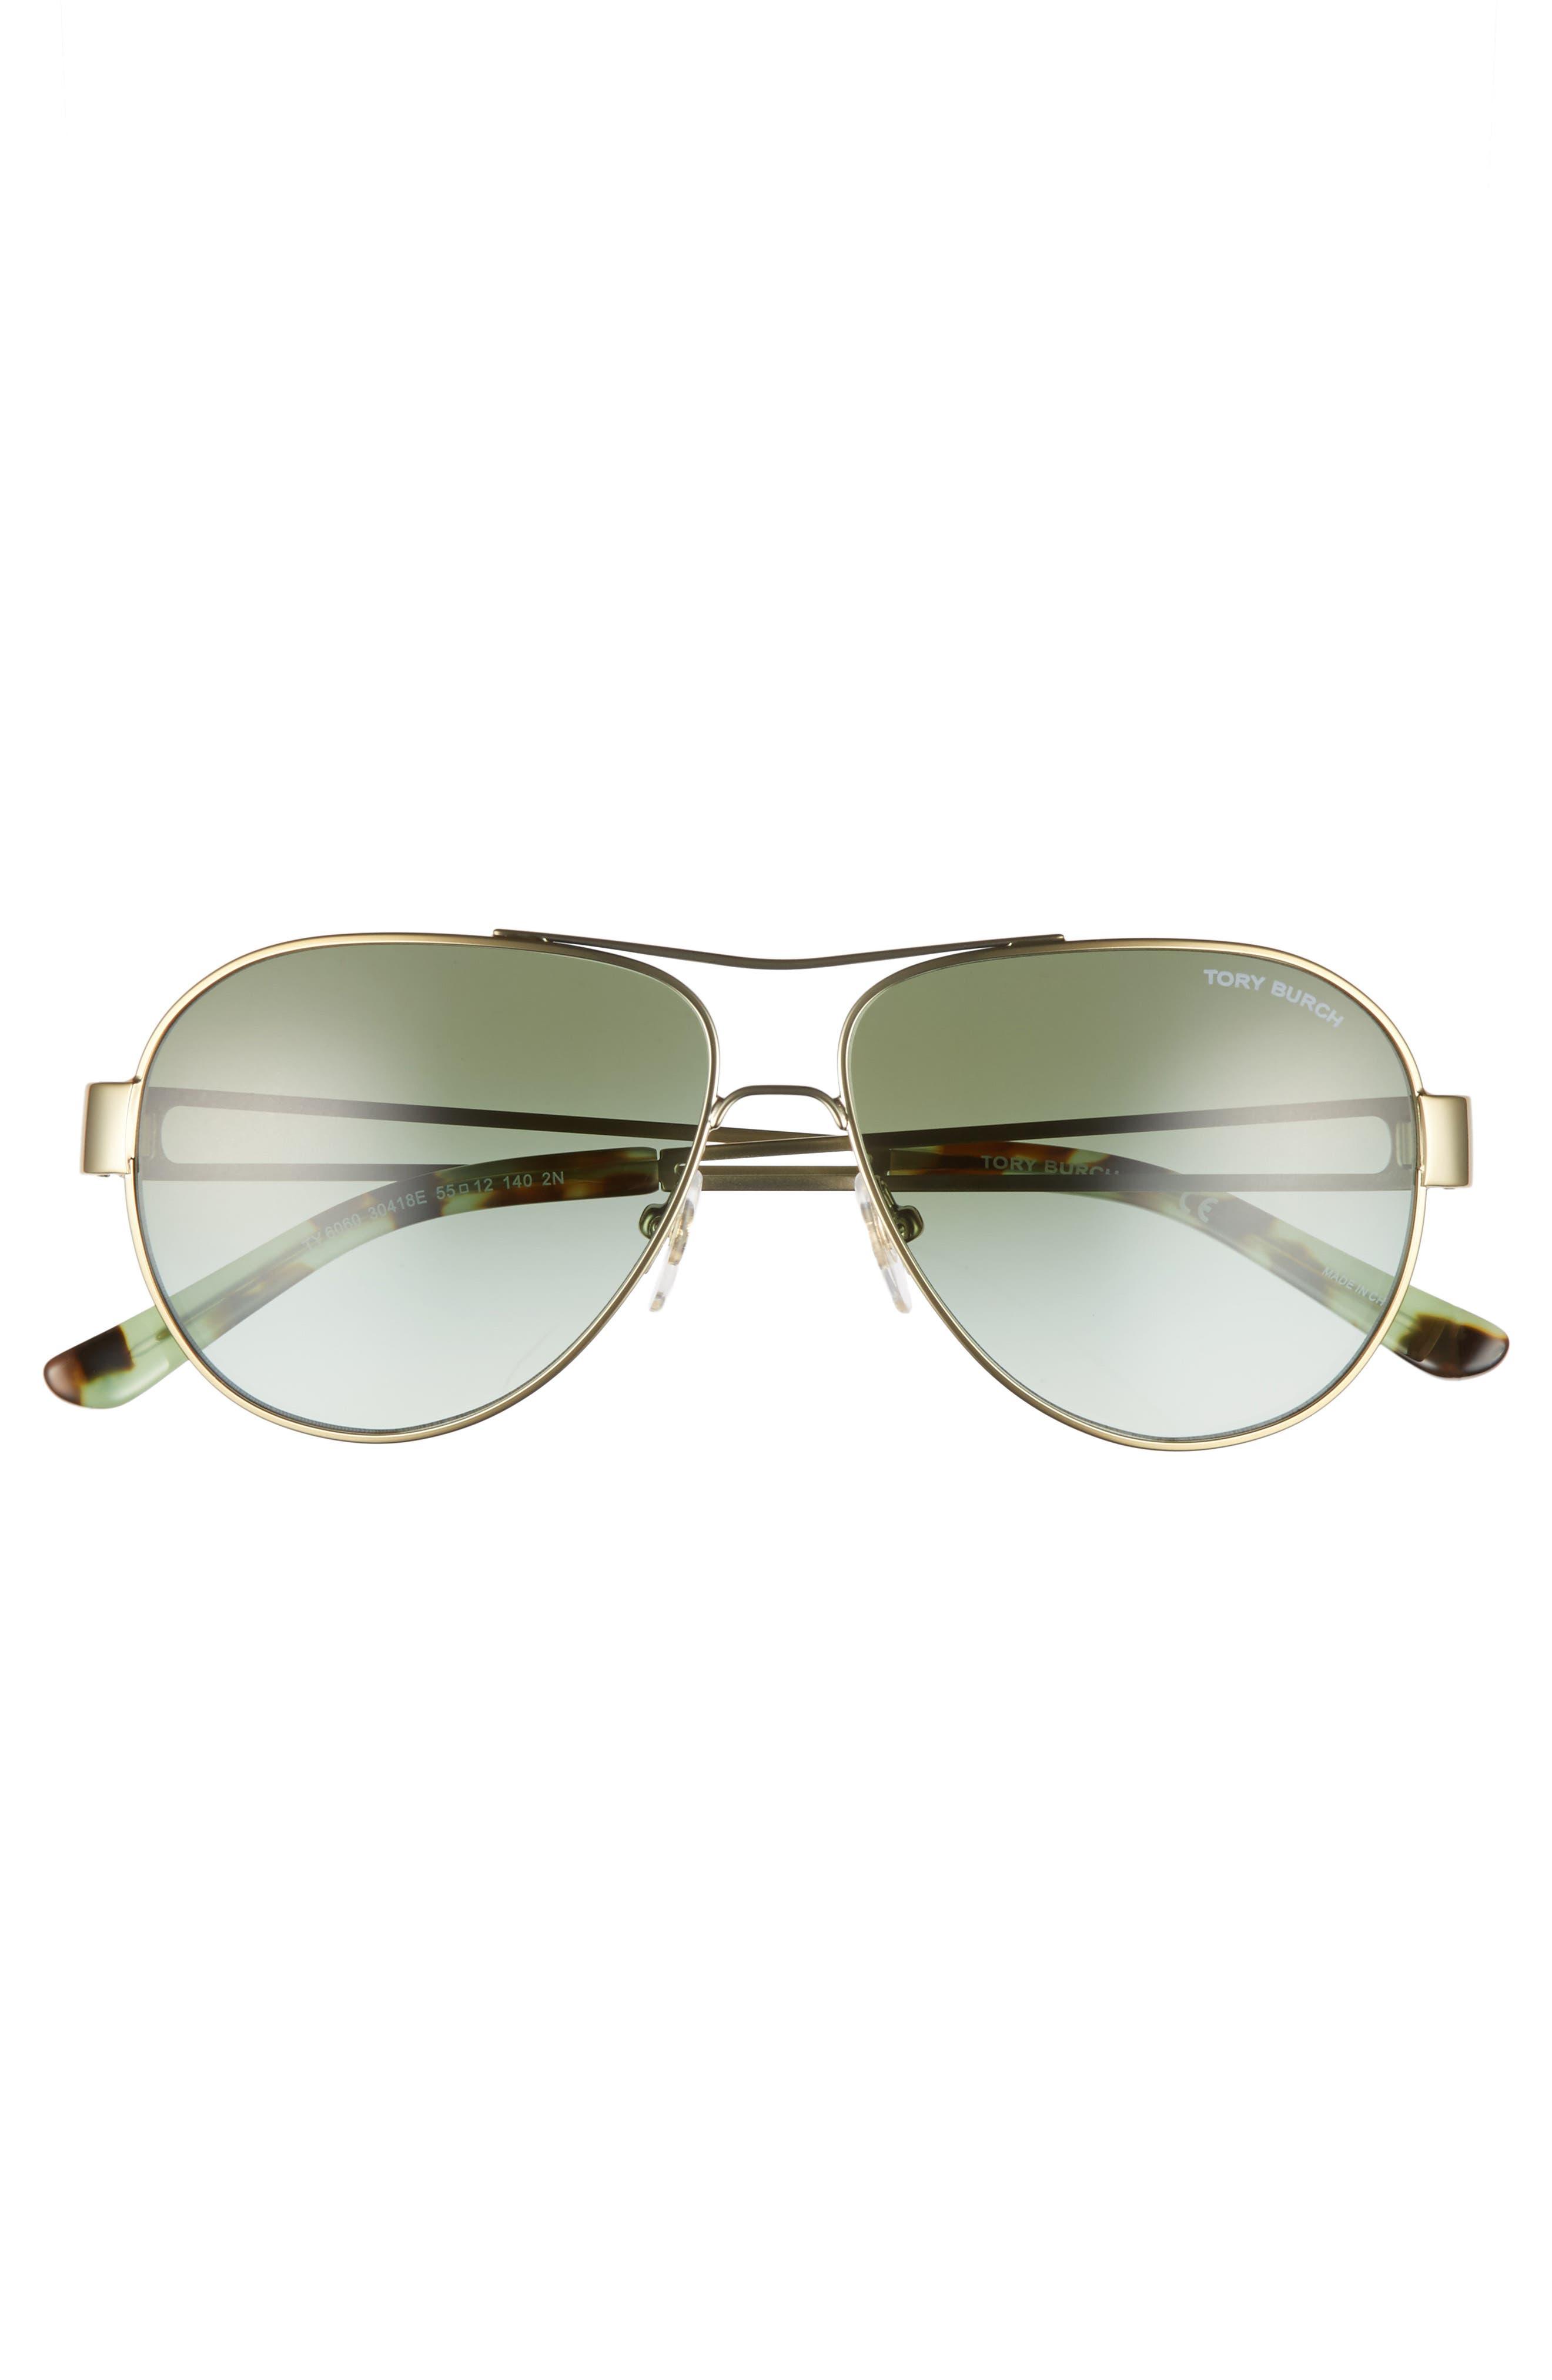 55mm Polarized Aviator Sunglasses,                             Alternate thumbnail 12, color,